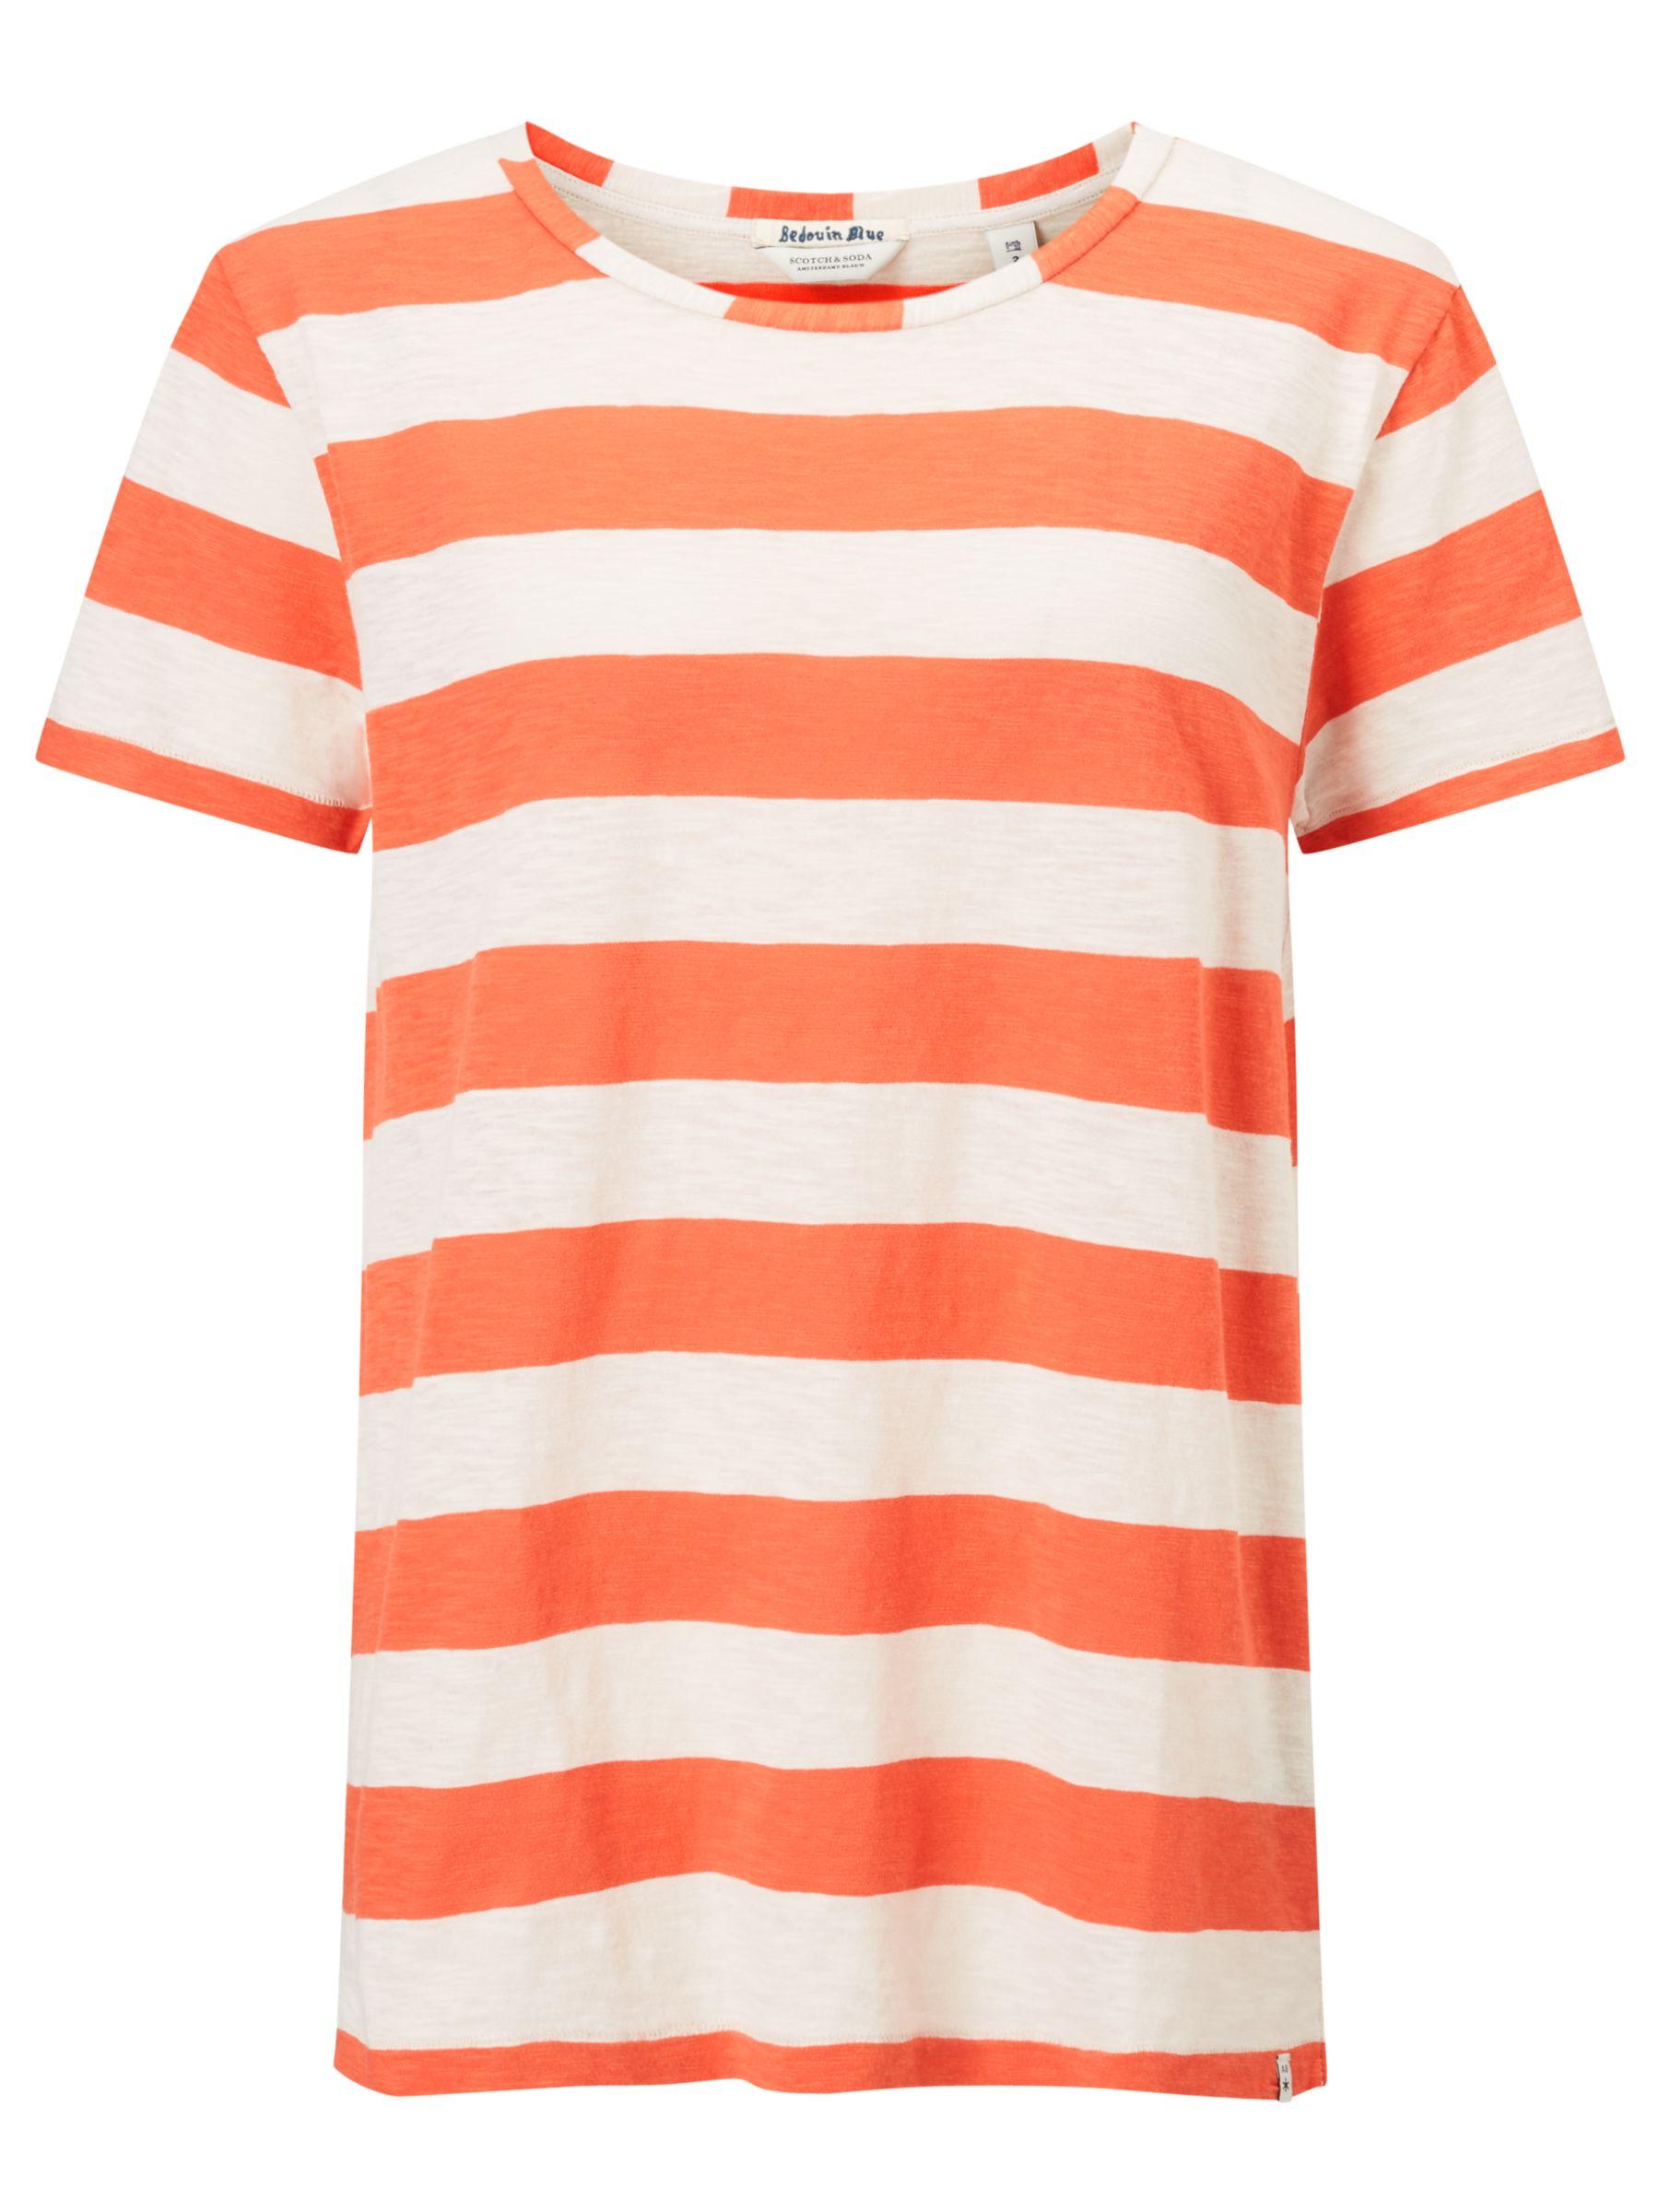 Maison Scotch Maison Scotch Loose Fit Stripe T-Shirt